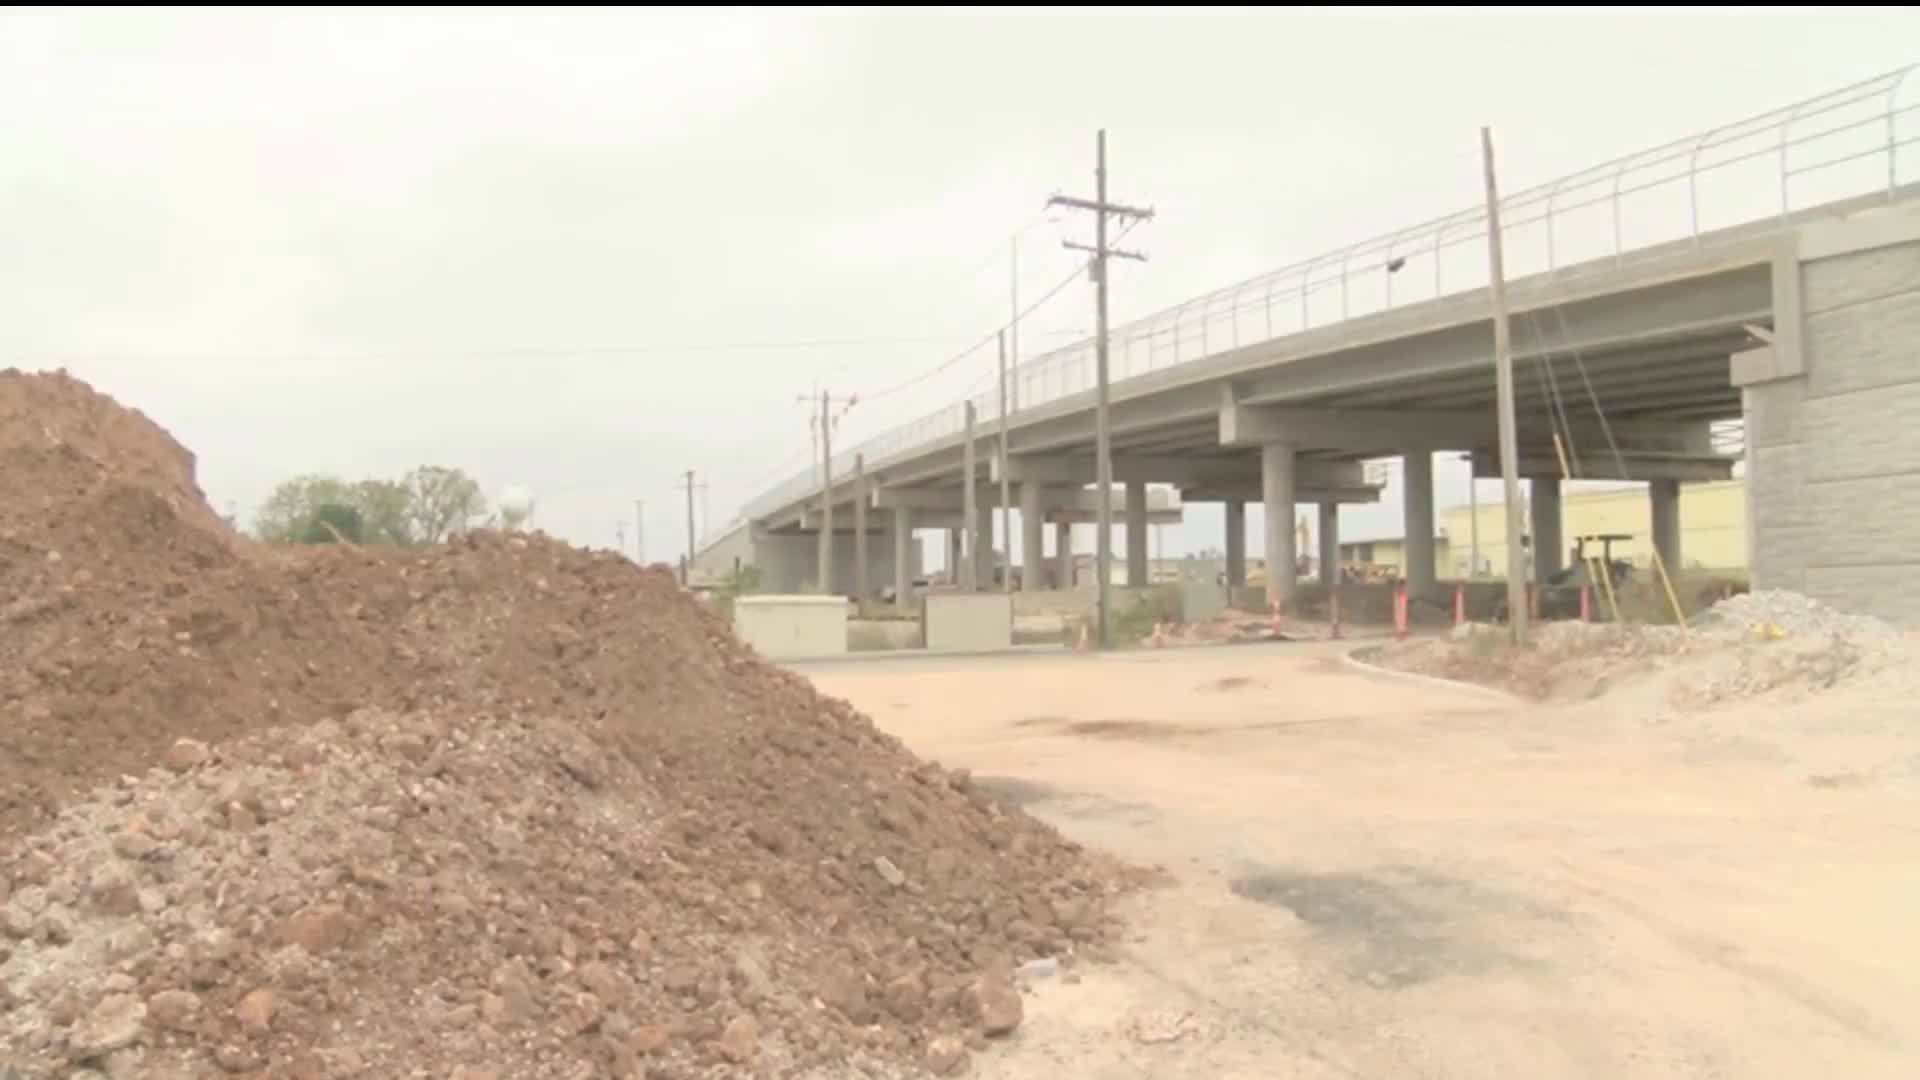 State_Budget_set_to_improve_bridges_if_p_1_20190509031255